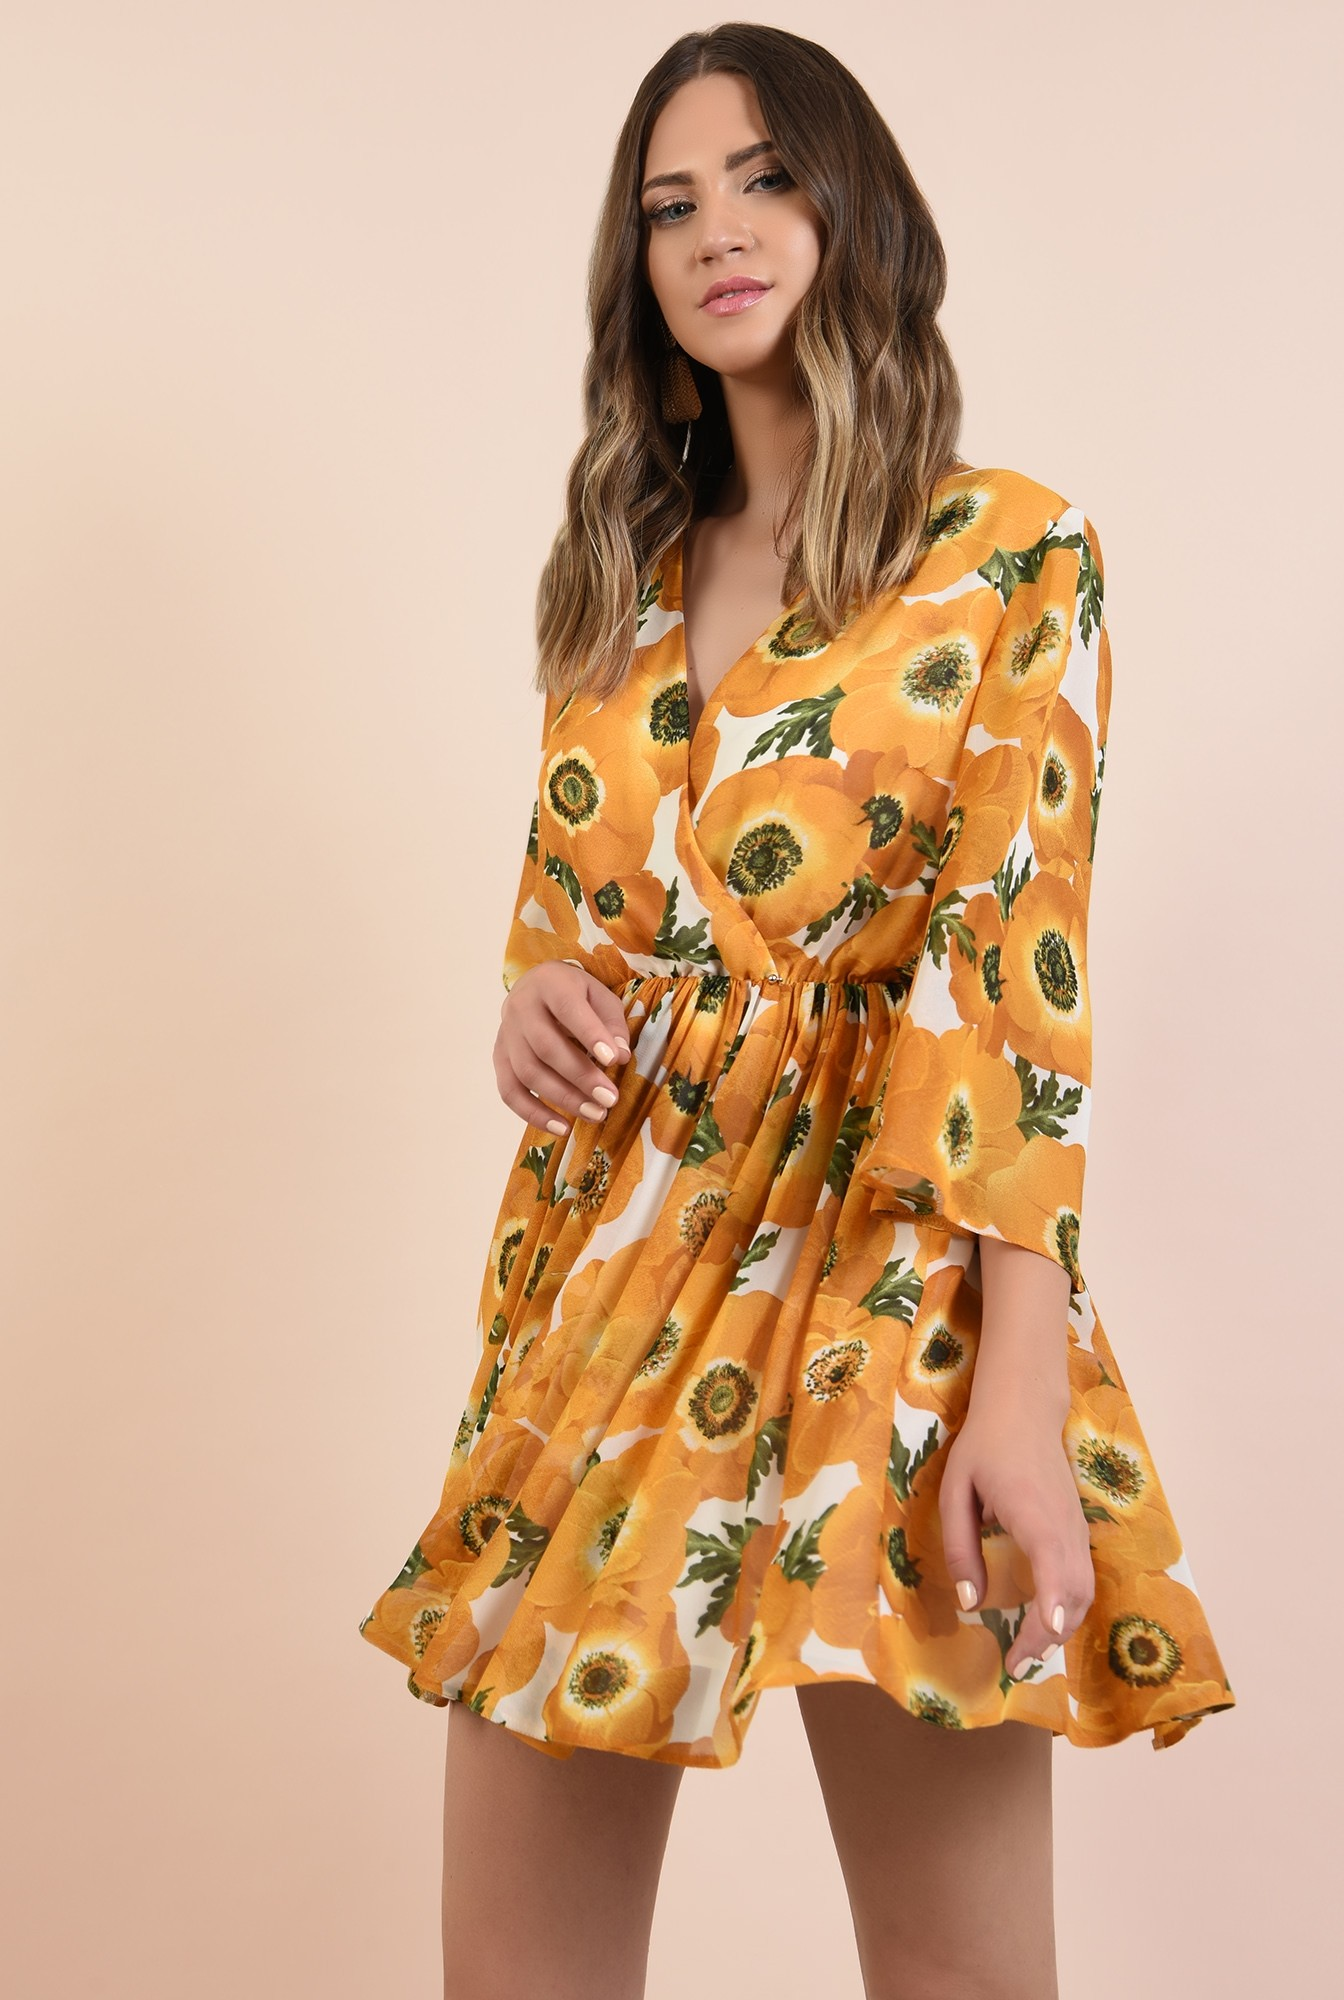 0 - 360 - rochie imprimata, casual, clos, talie pe elastic, motive florale